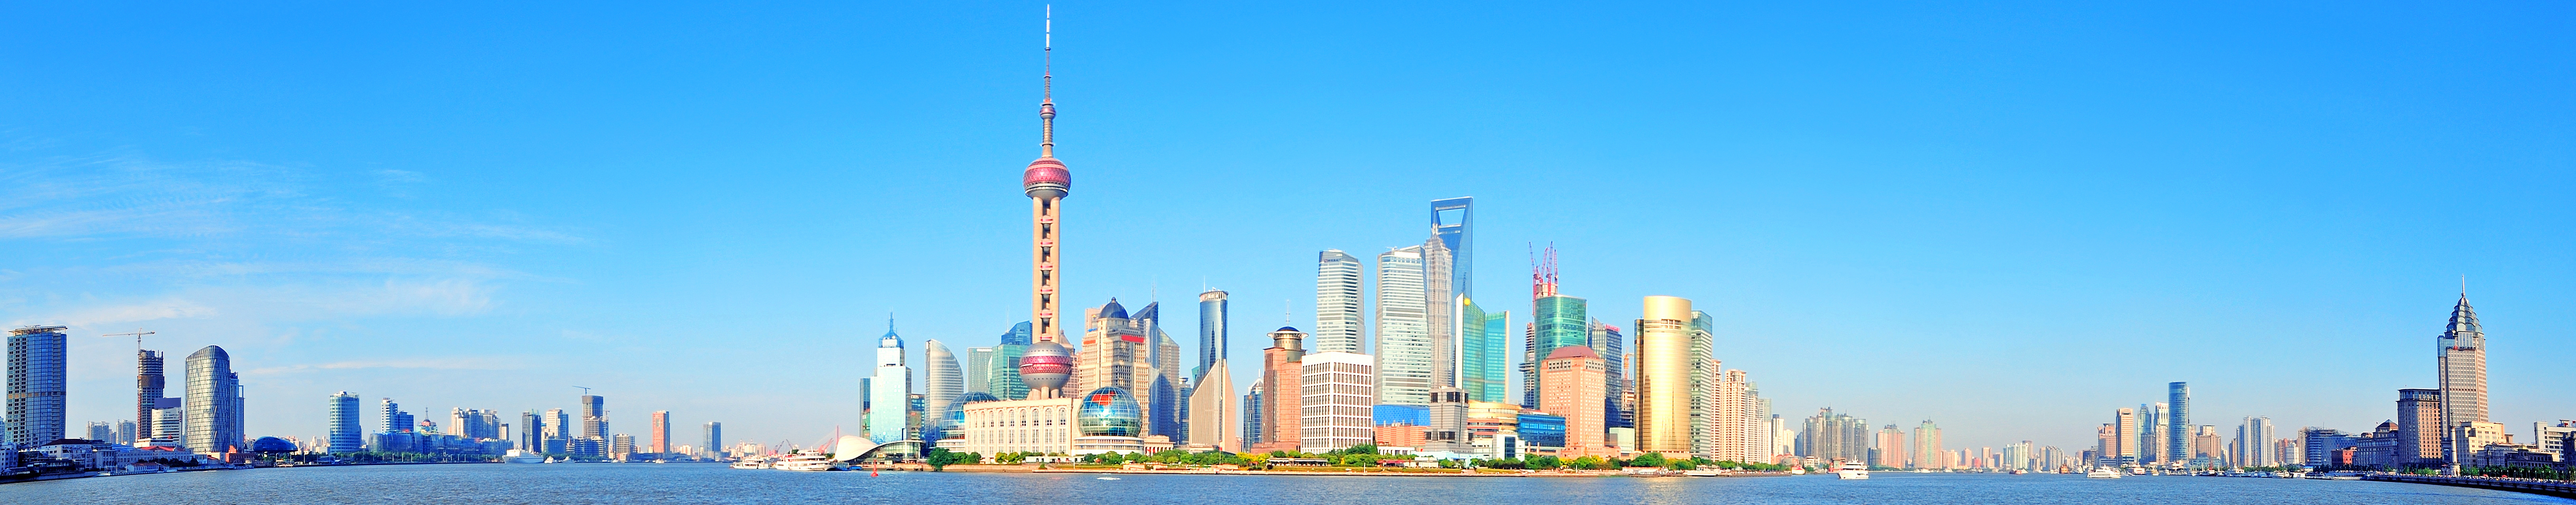 visa info china shanghai skyline berge und meer